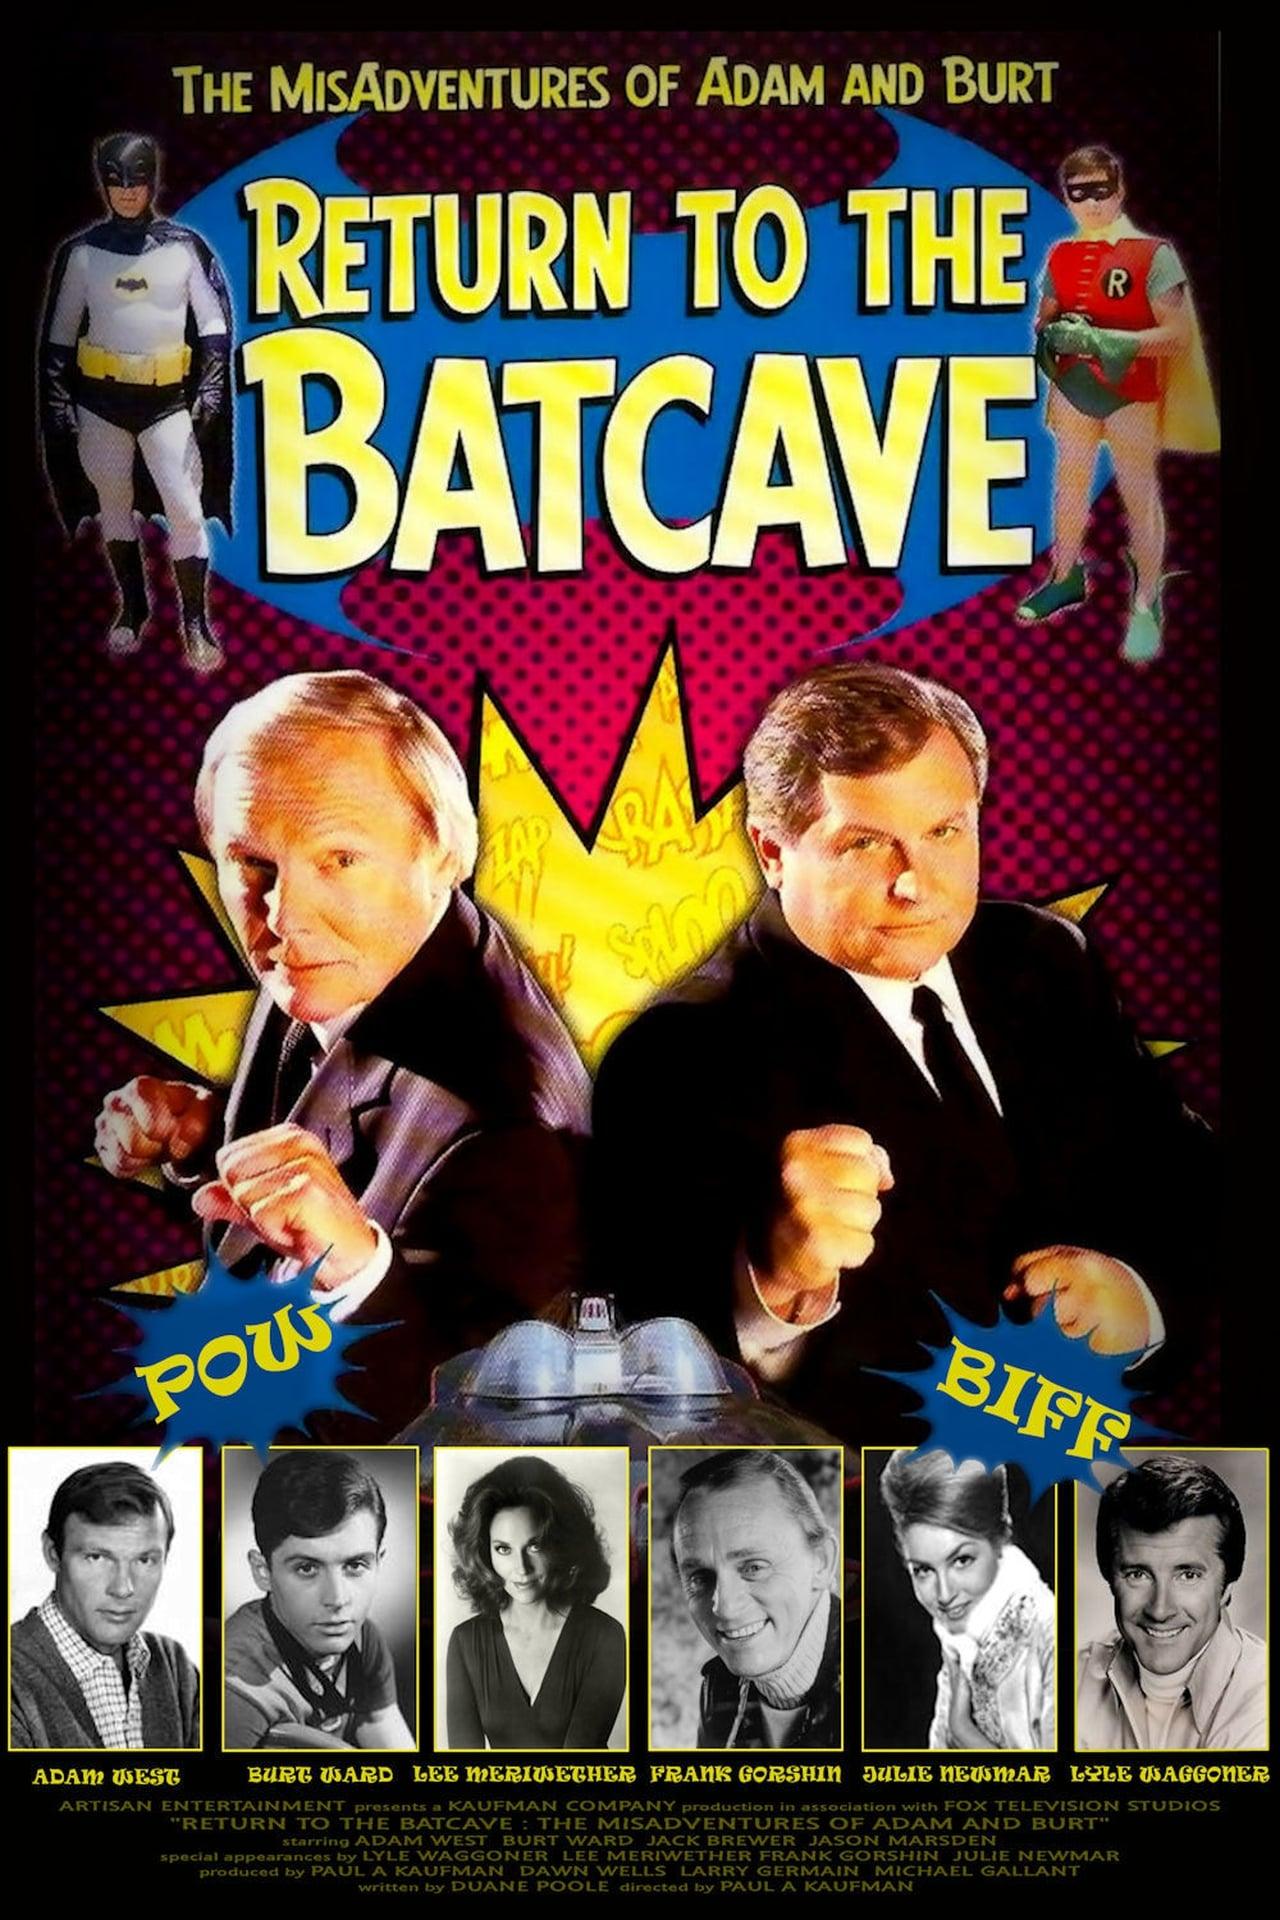 Return to the Batcave - The Misadventures of Adam and Burt